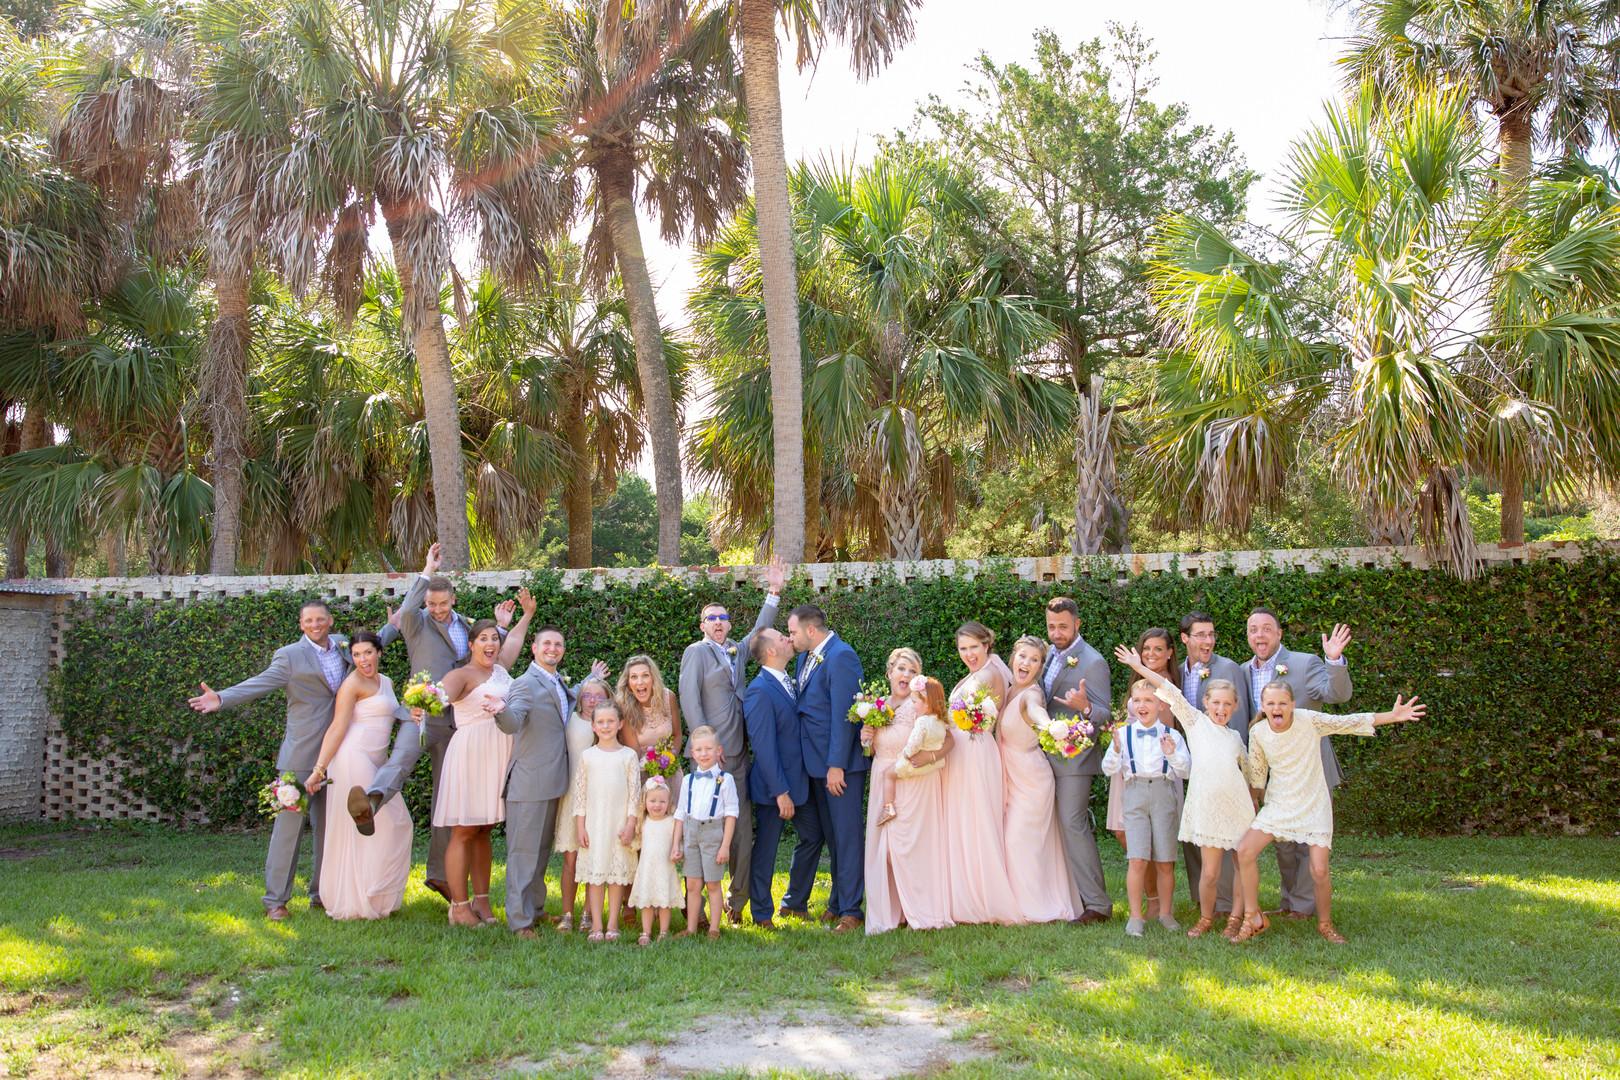 atalaya-castle-wedding-36.jpg